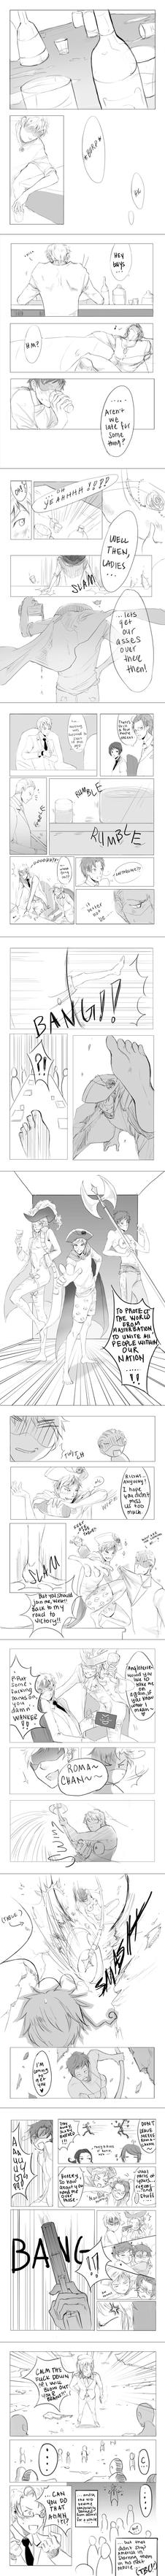 APH doujin: bad drunk trio by hakuku